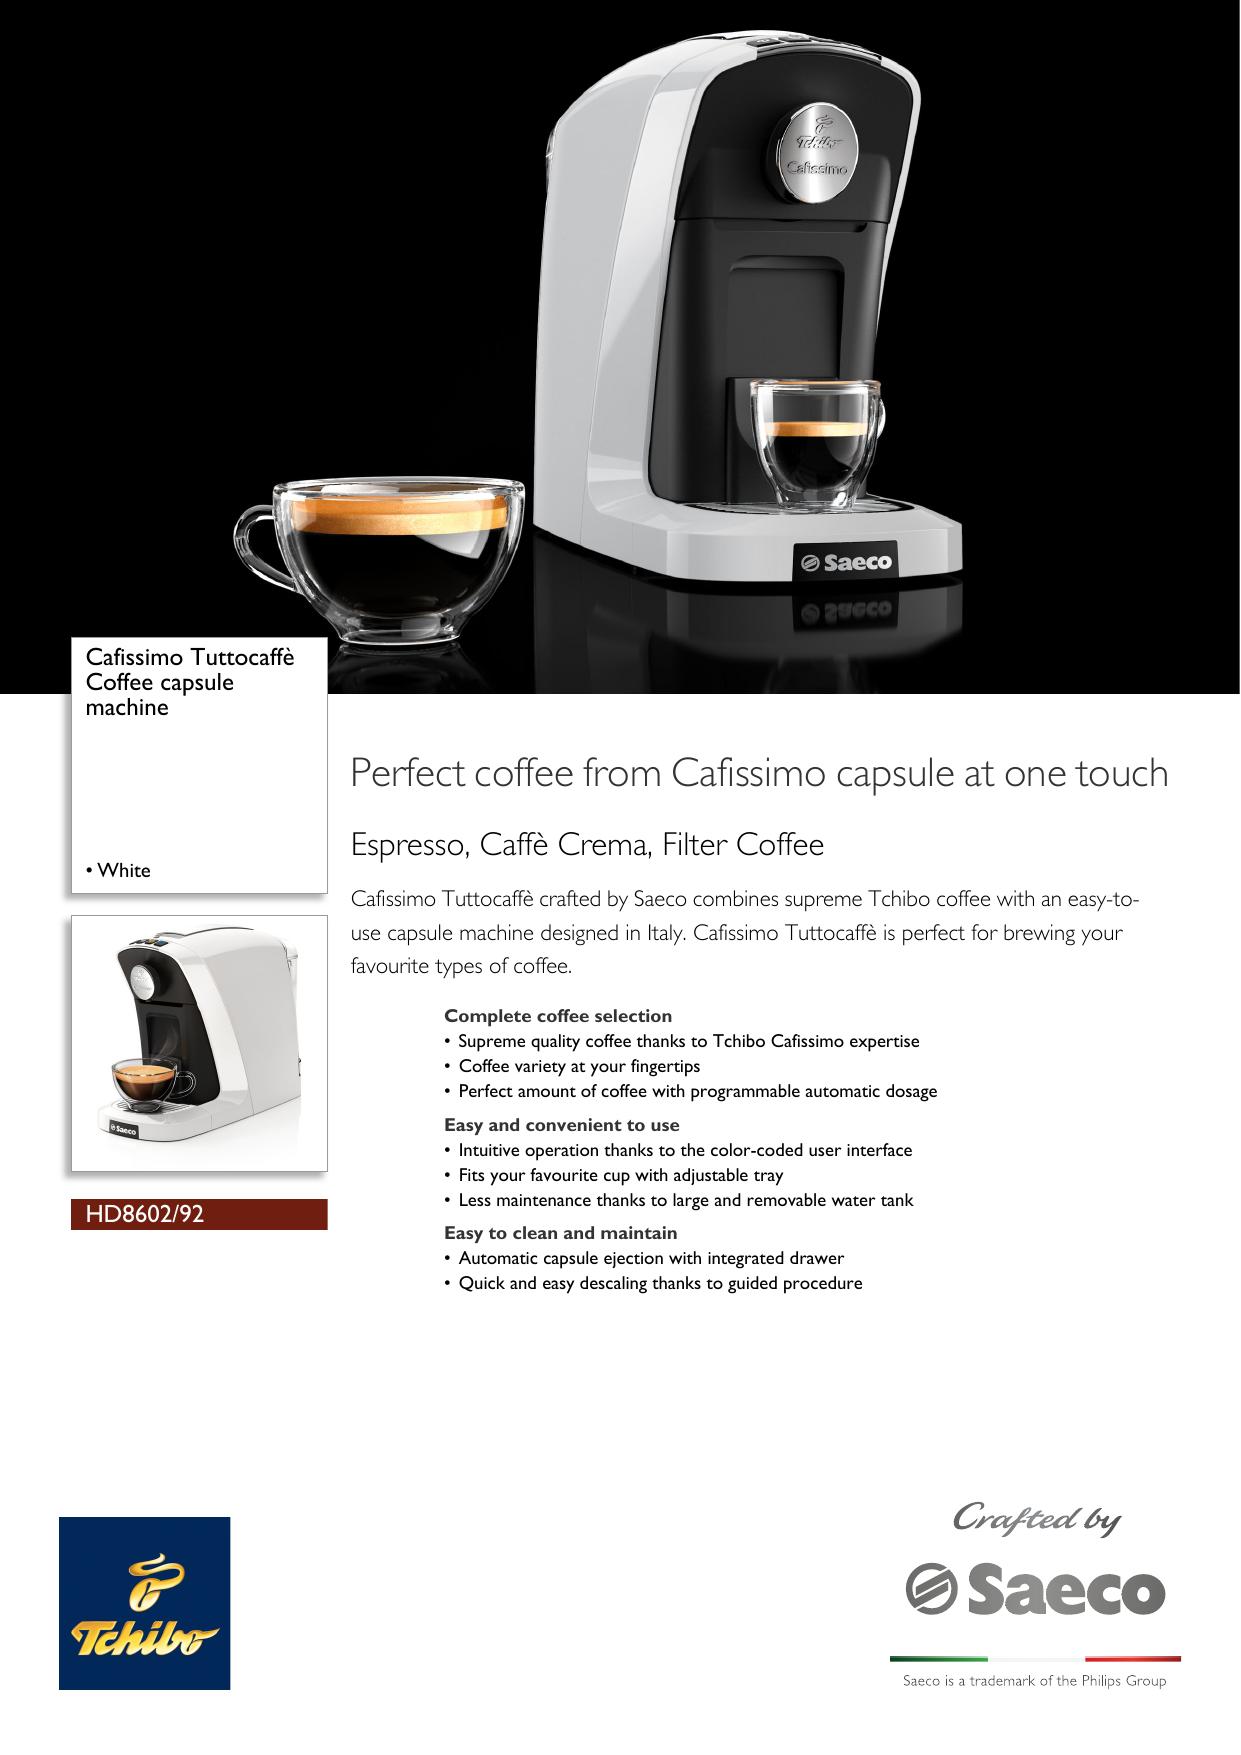 Philips Hd860292 Cafissimo Coffee Capsule Machine